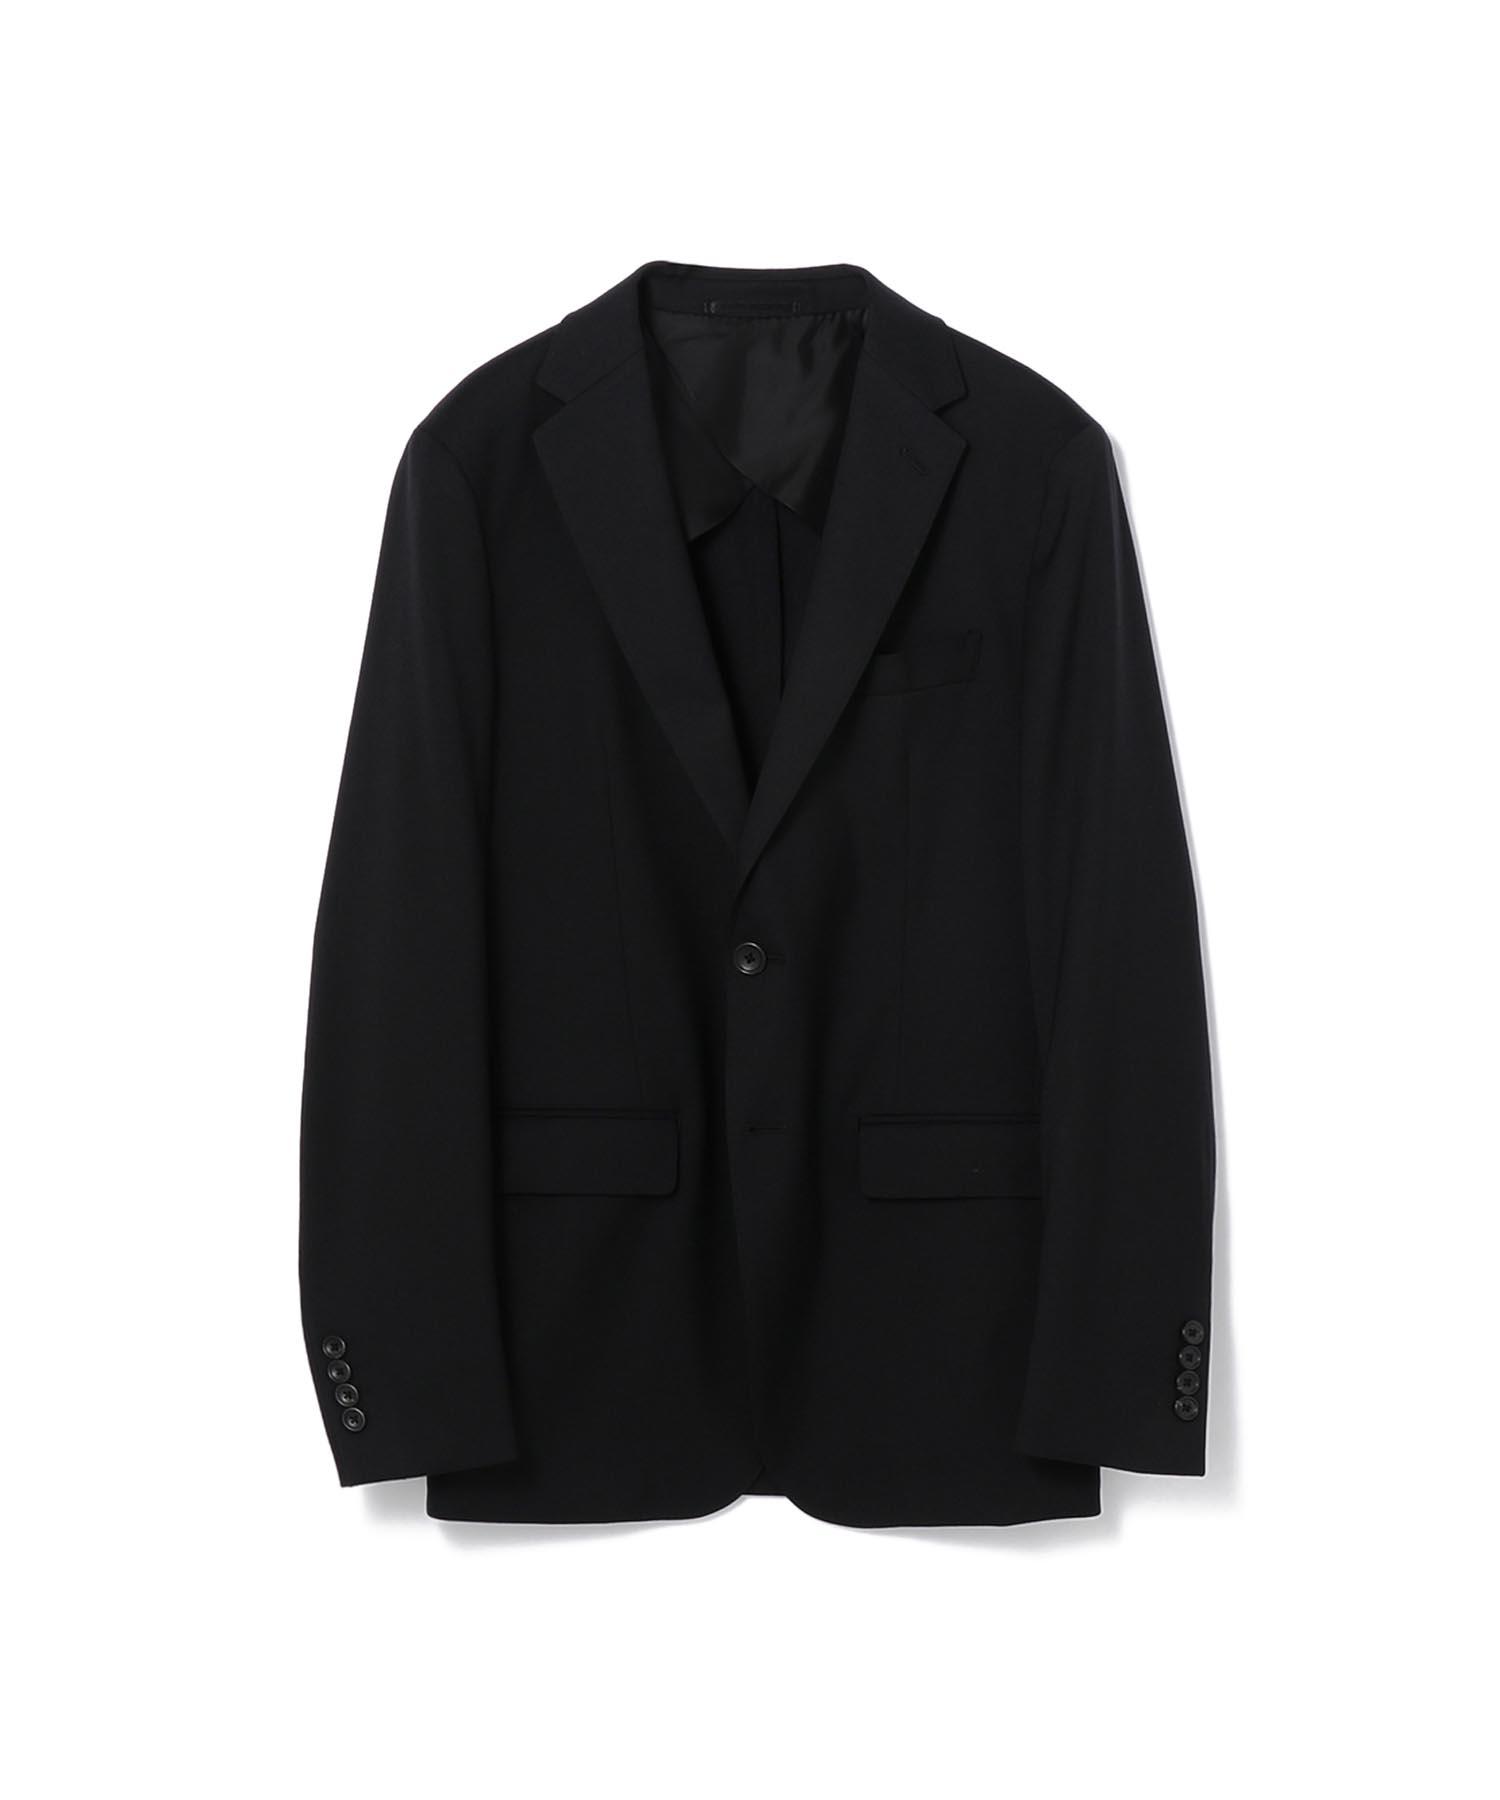 【LEON 11月号掲載商品】ESTNATION ソラーロ梳毛ウールジャケット<The Functional Wear>